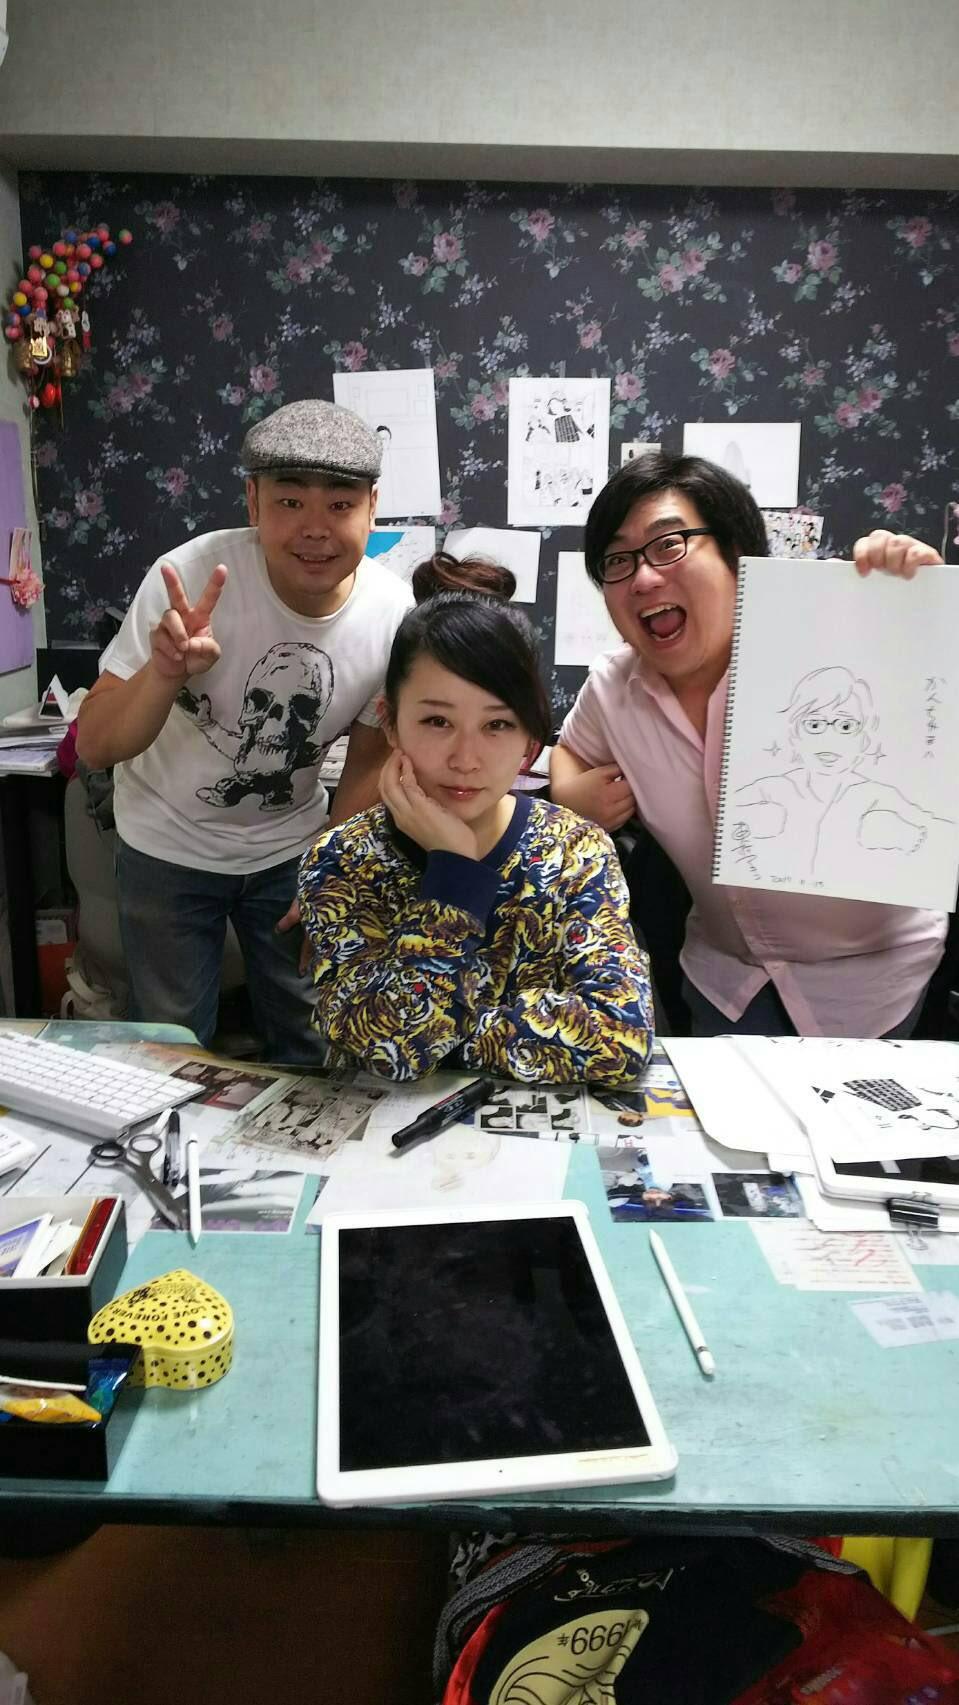 DOr7QtsUEAAHSH5 - 漫画家・東村アキコって息子がいるの?